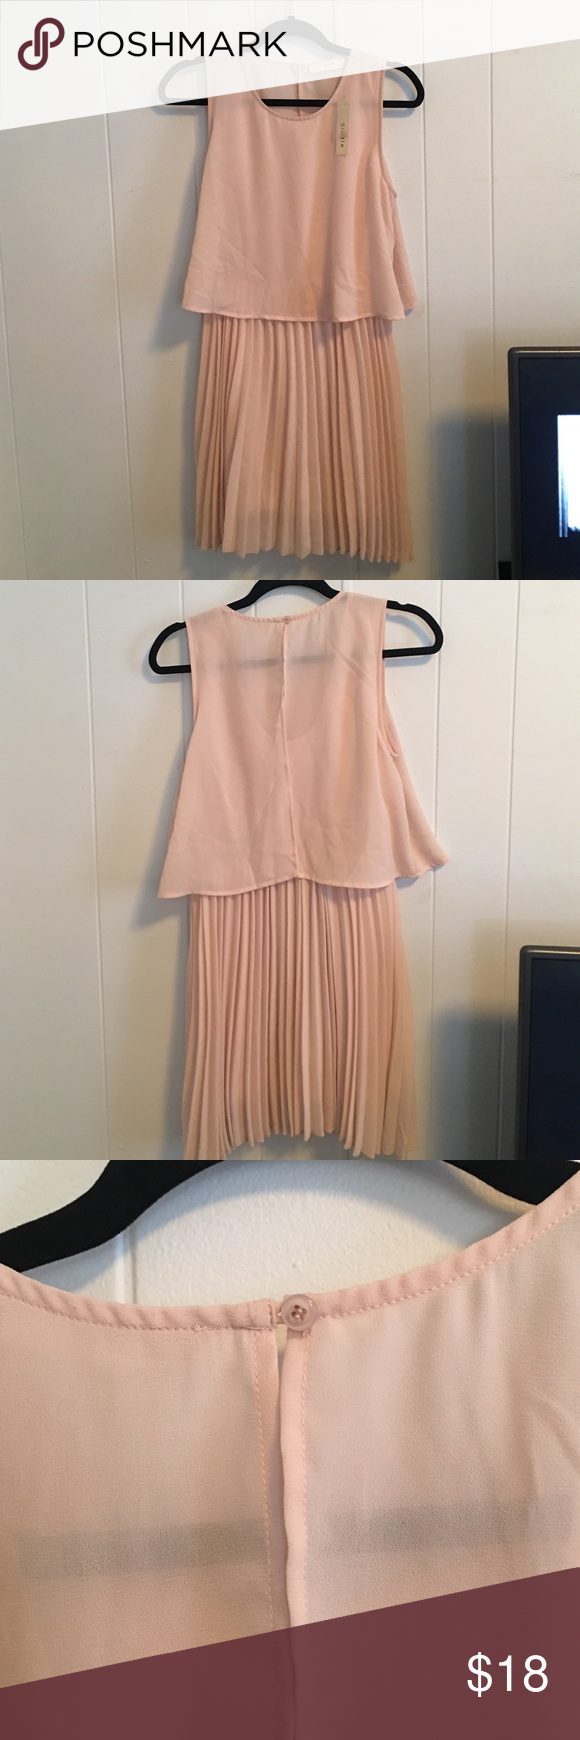 Makeup with light pink dress  Light pink dress Elodie light pink accordion style dress One button